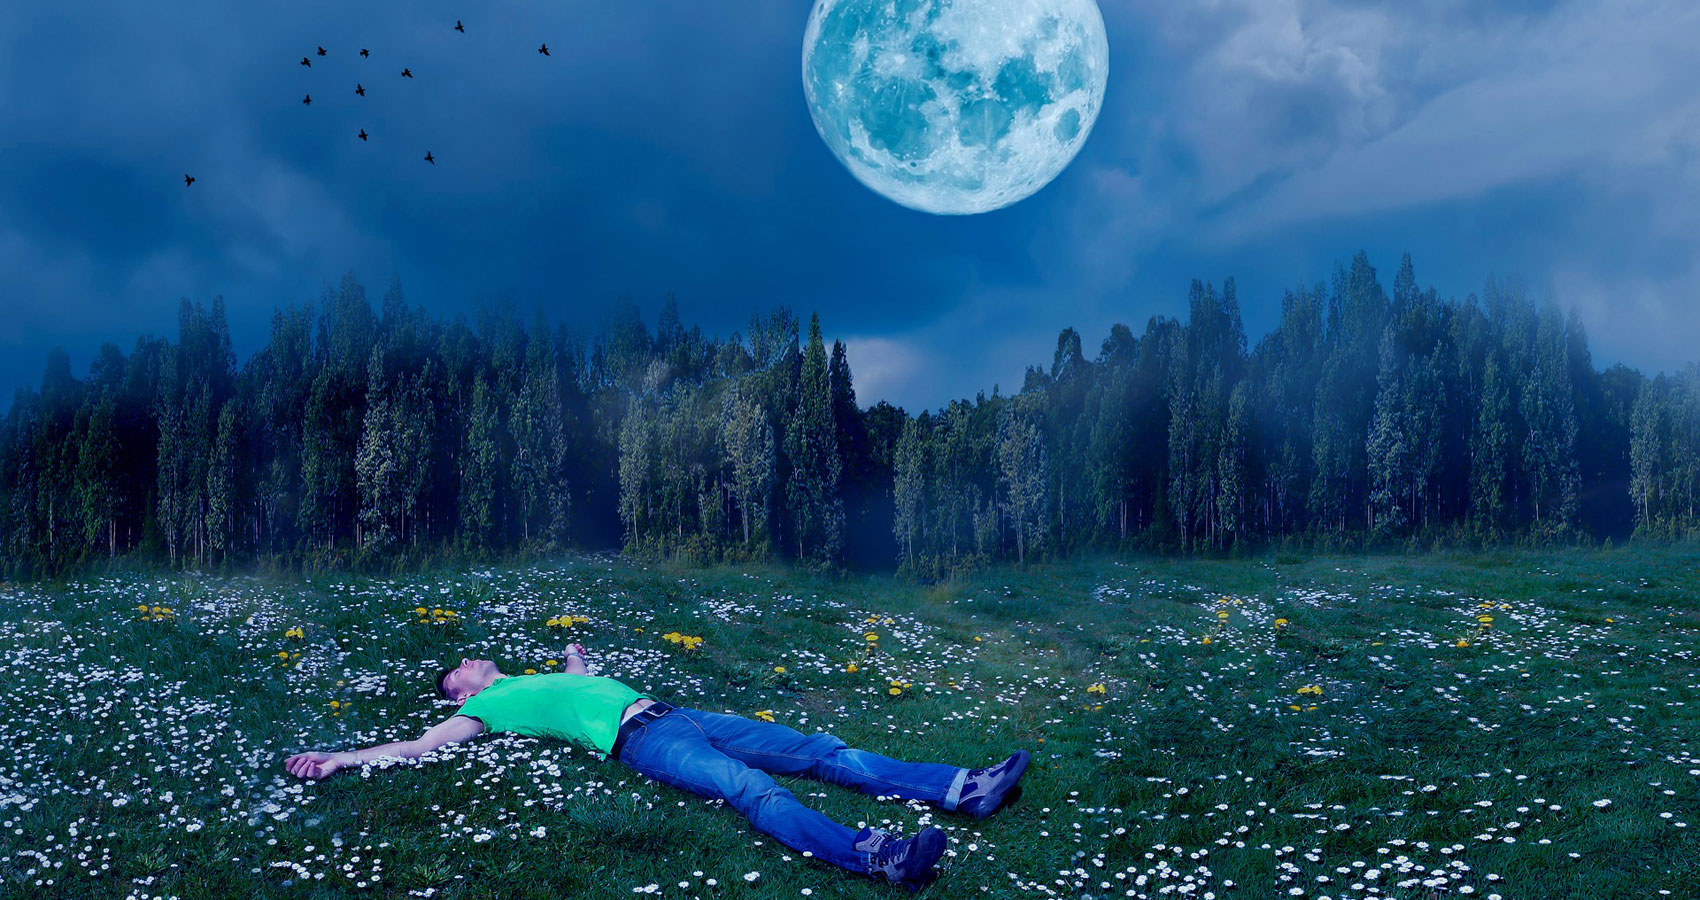 Sleeping Man written by Dru Free at Spillwords.com